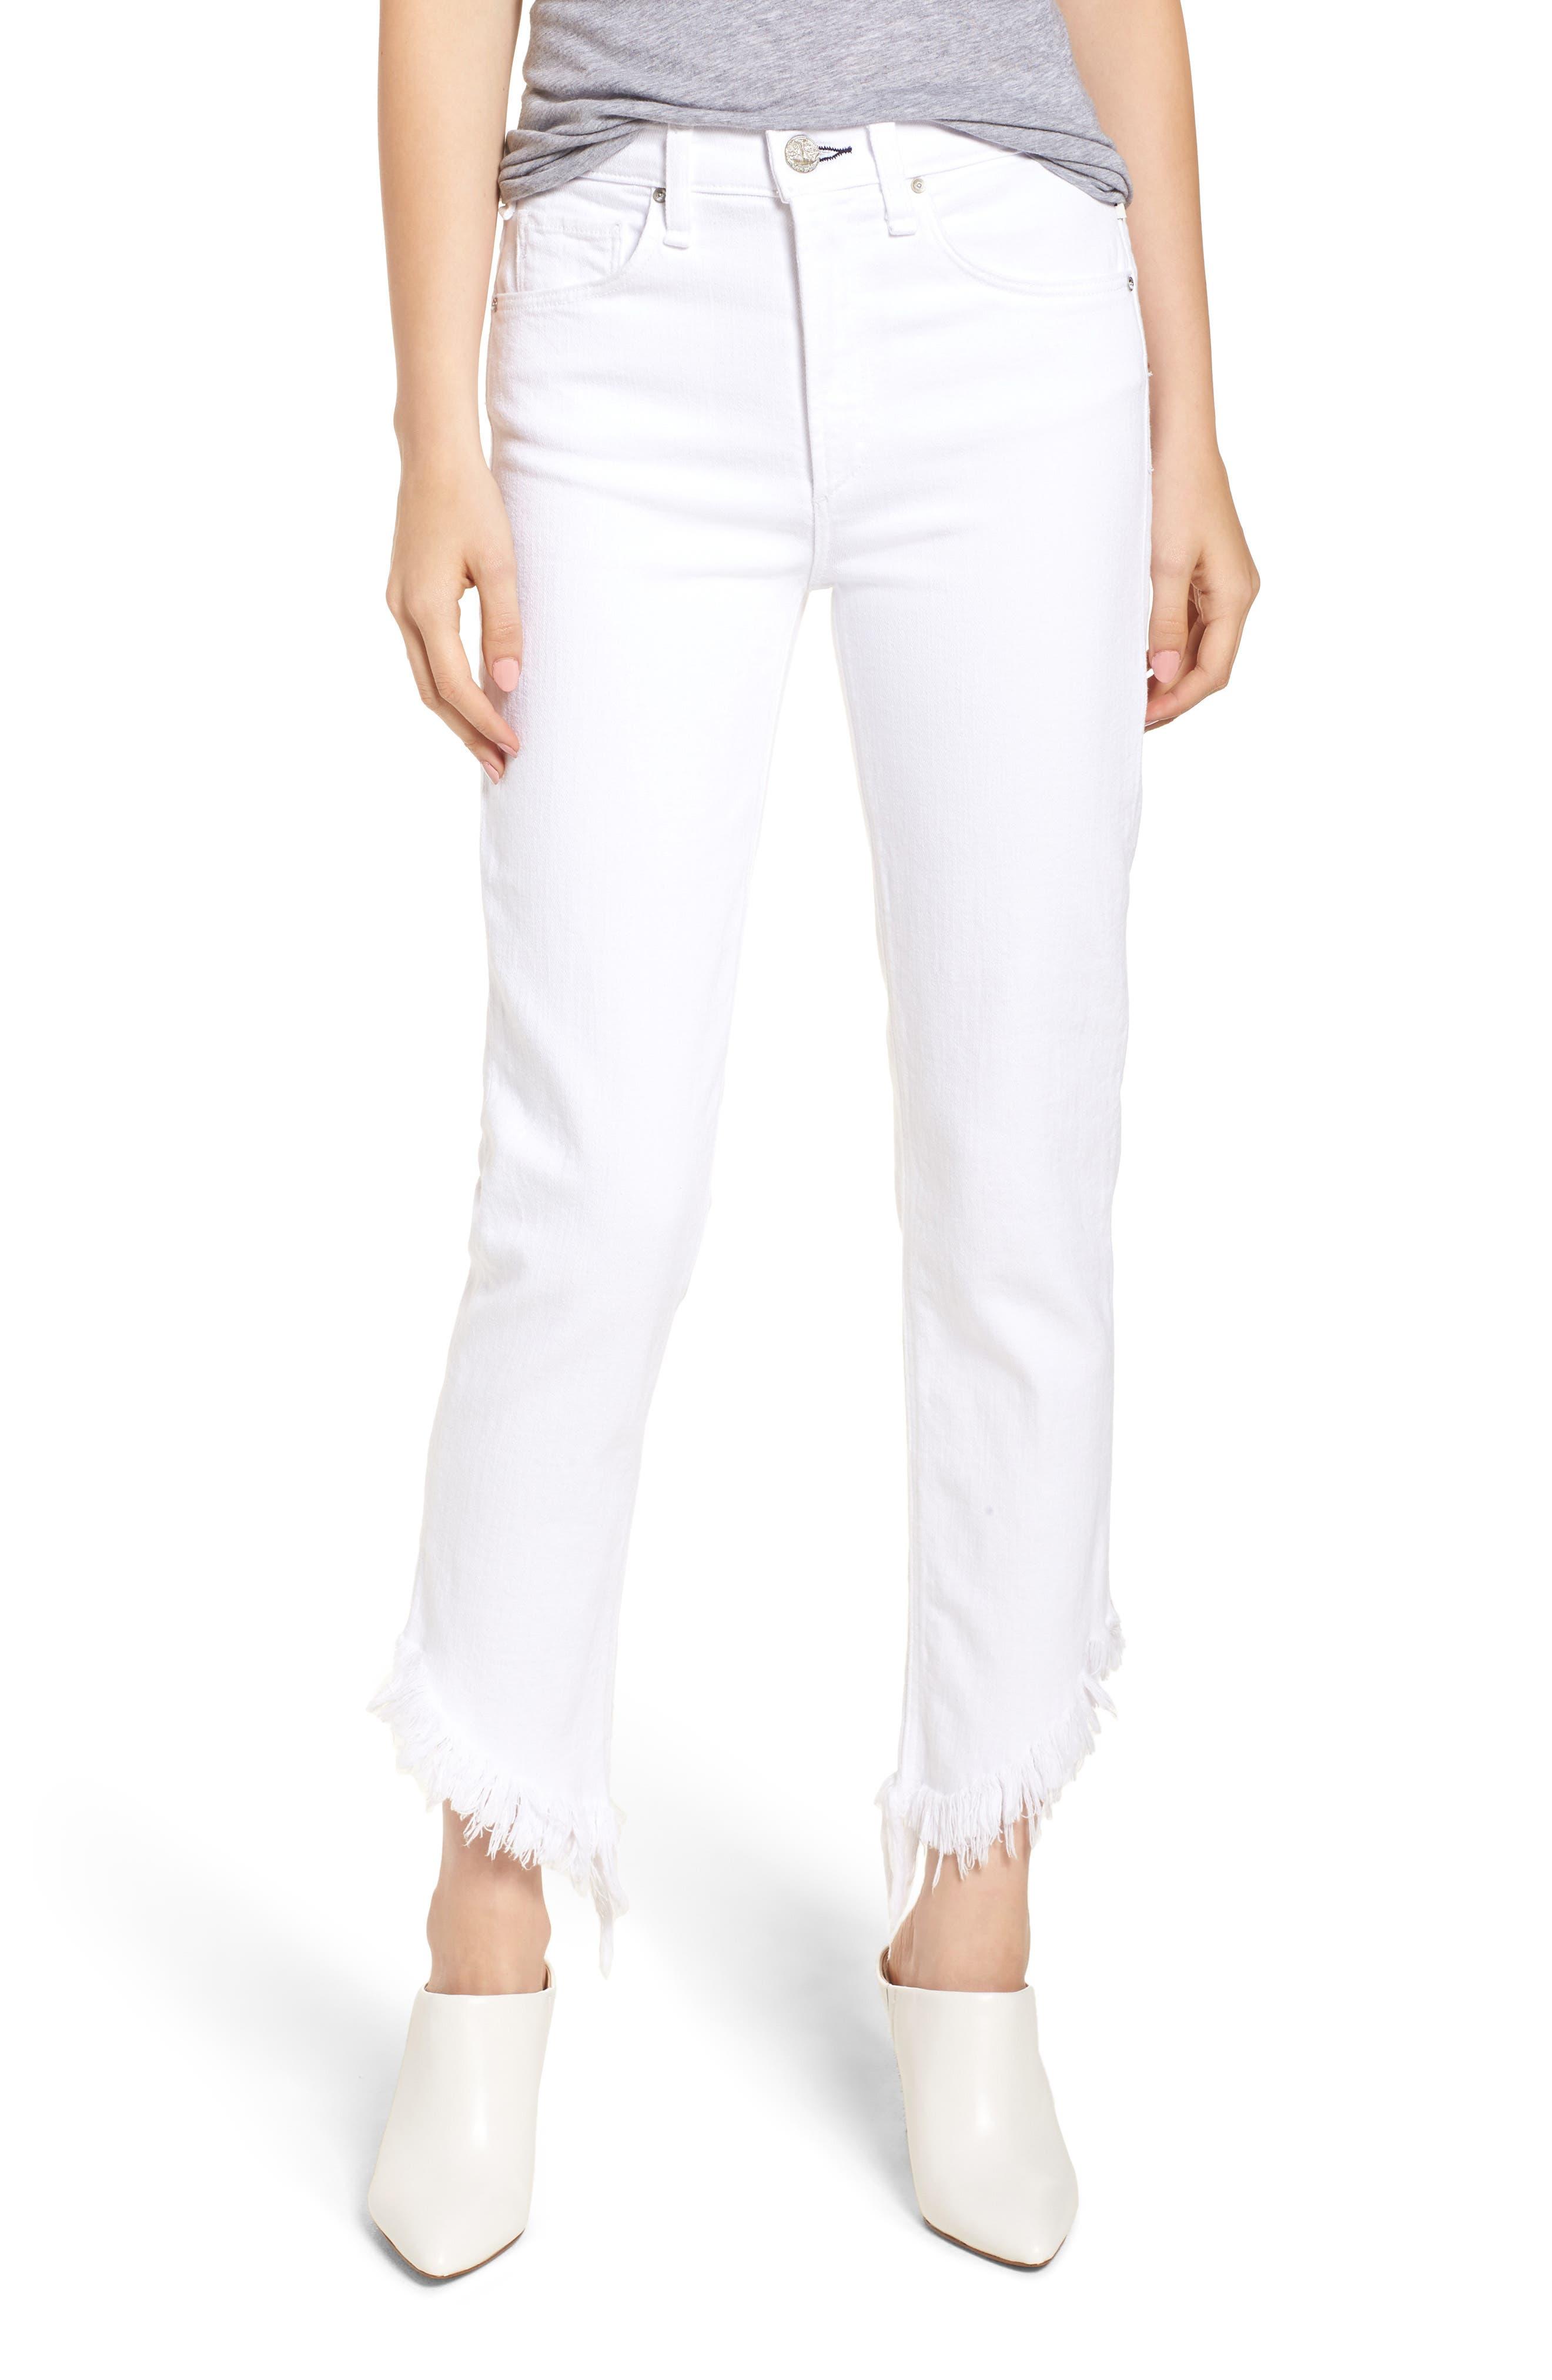 Valletta High Waist Crop Straight Leg Jeans,                         Main,                         color, 100